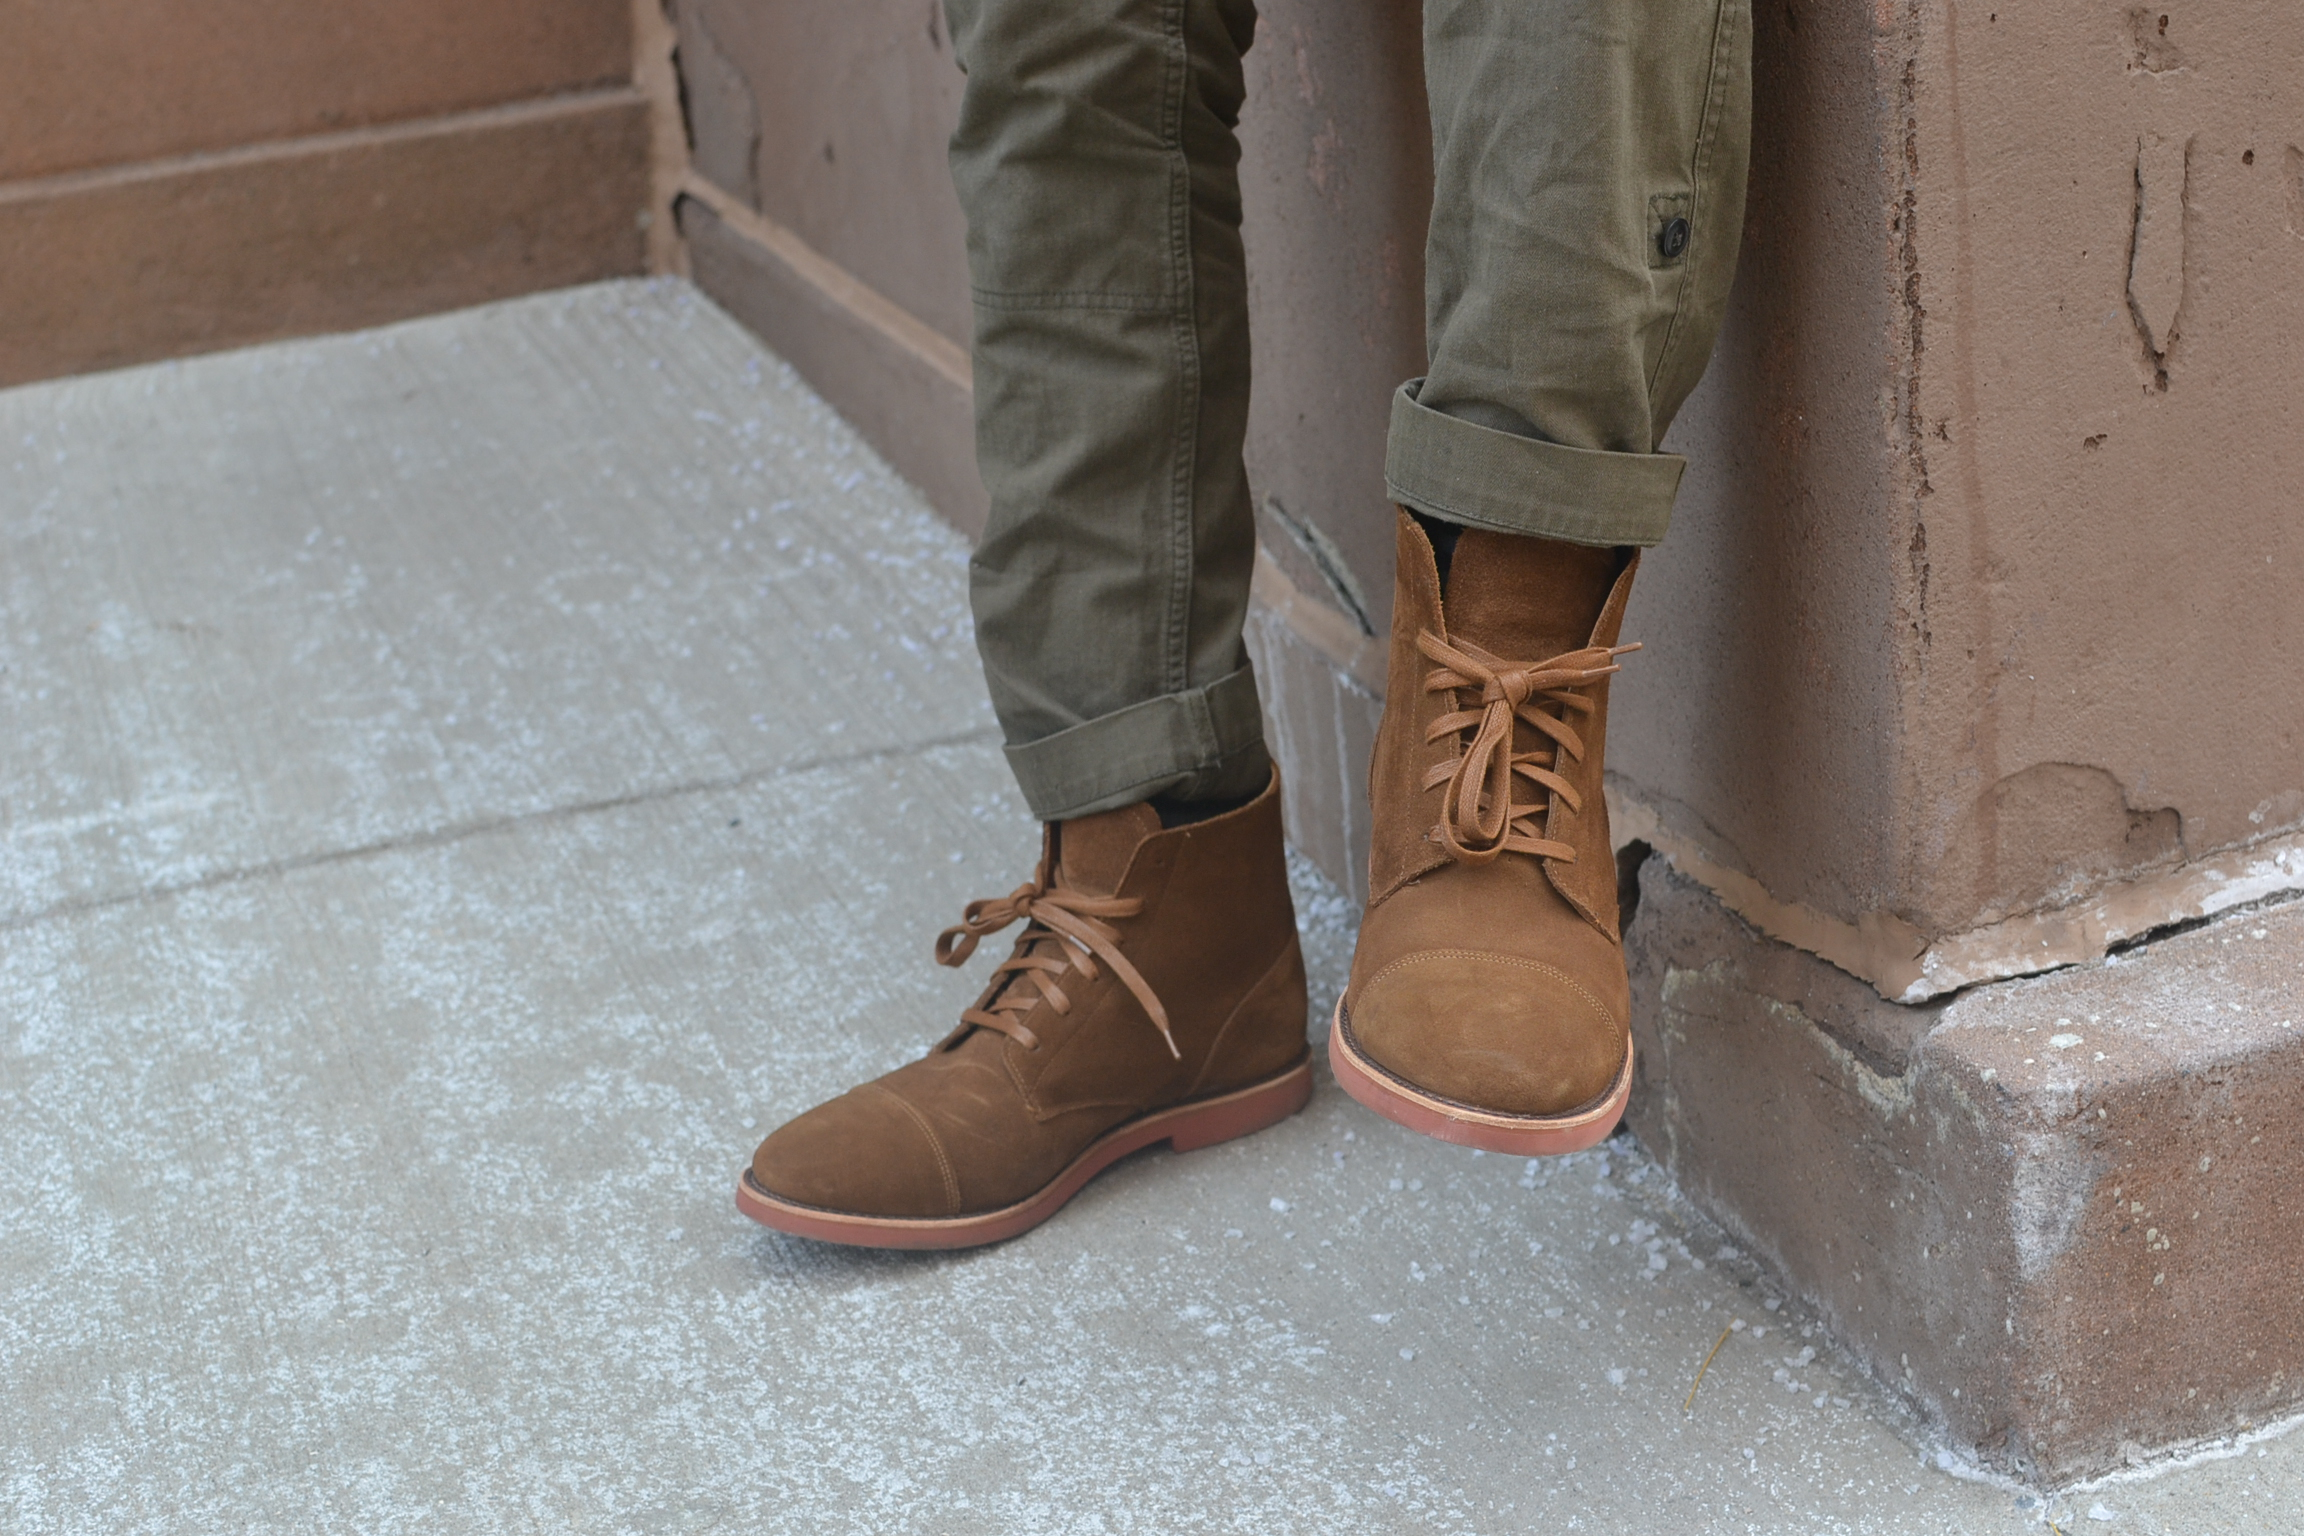 Walk Over Shoes Humboldt